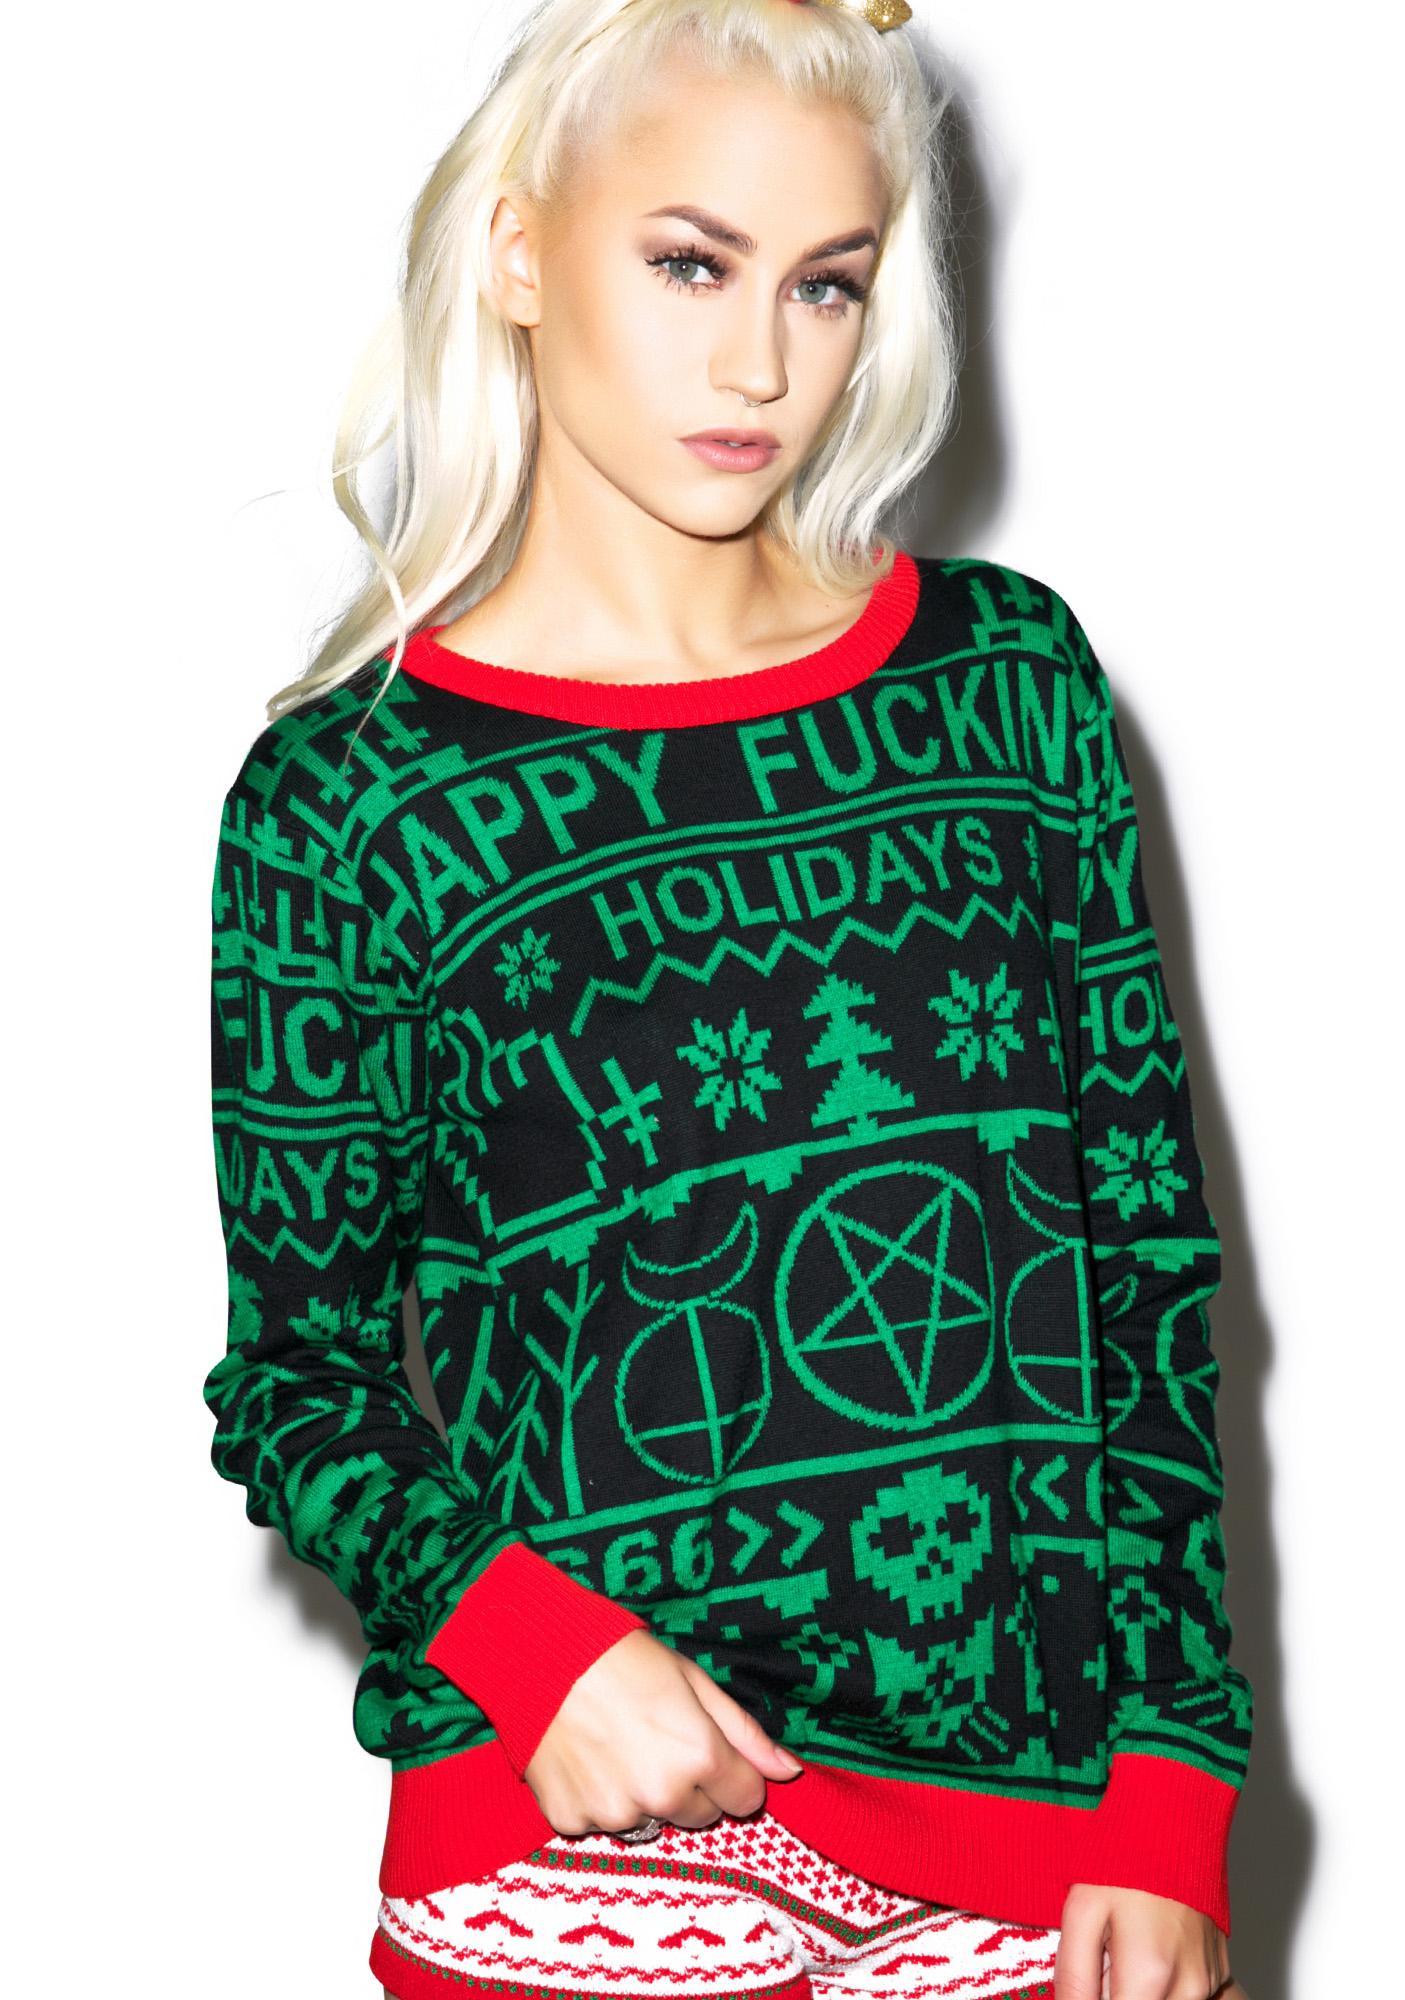 Happy Fucking Holidays Sweater